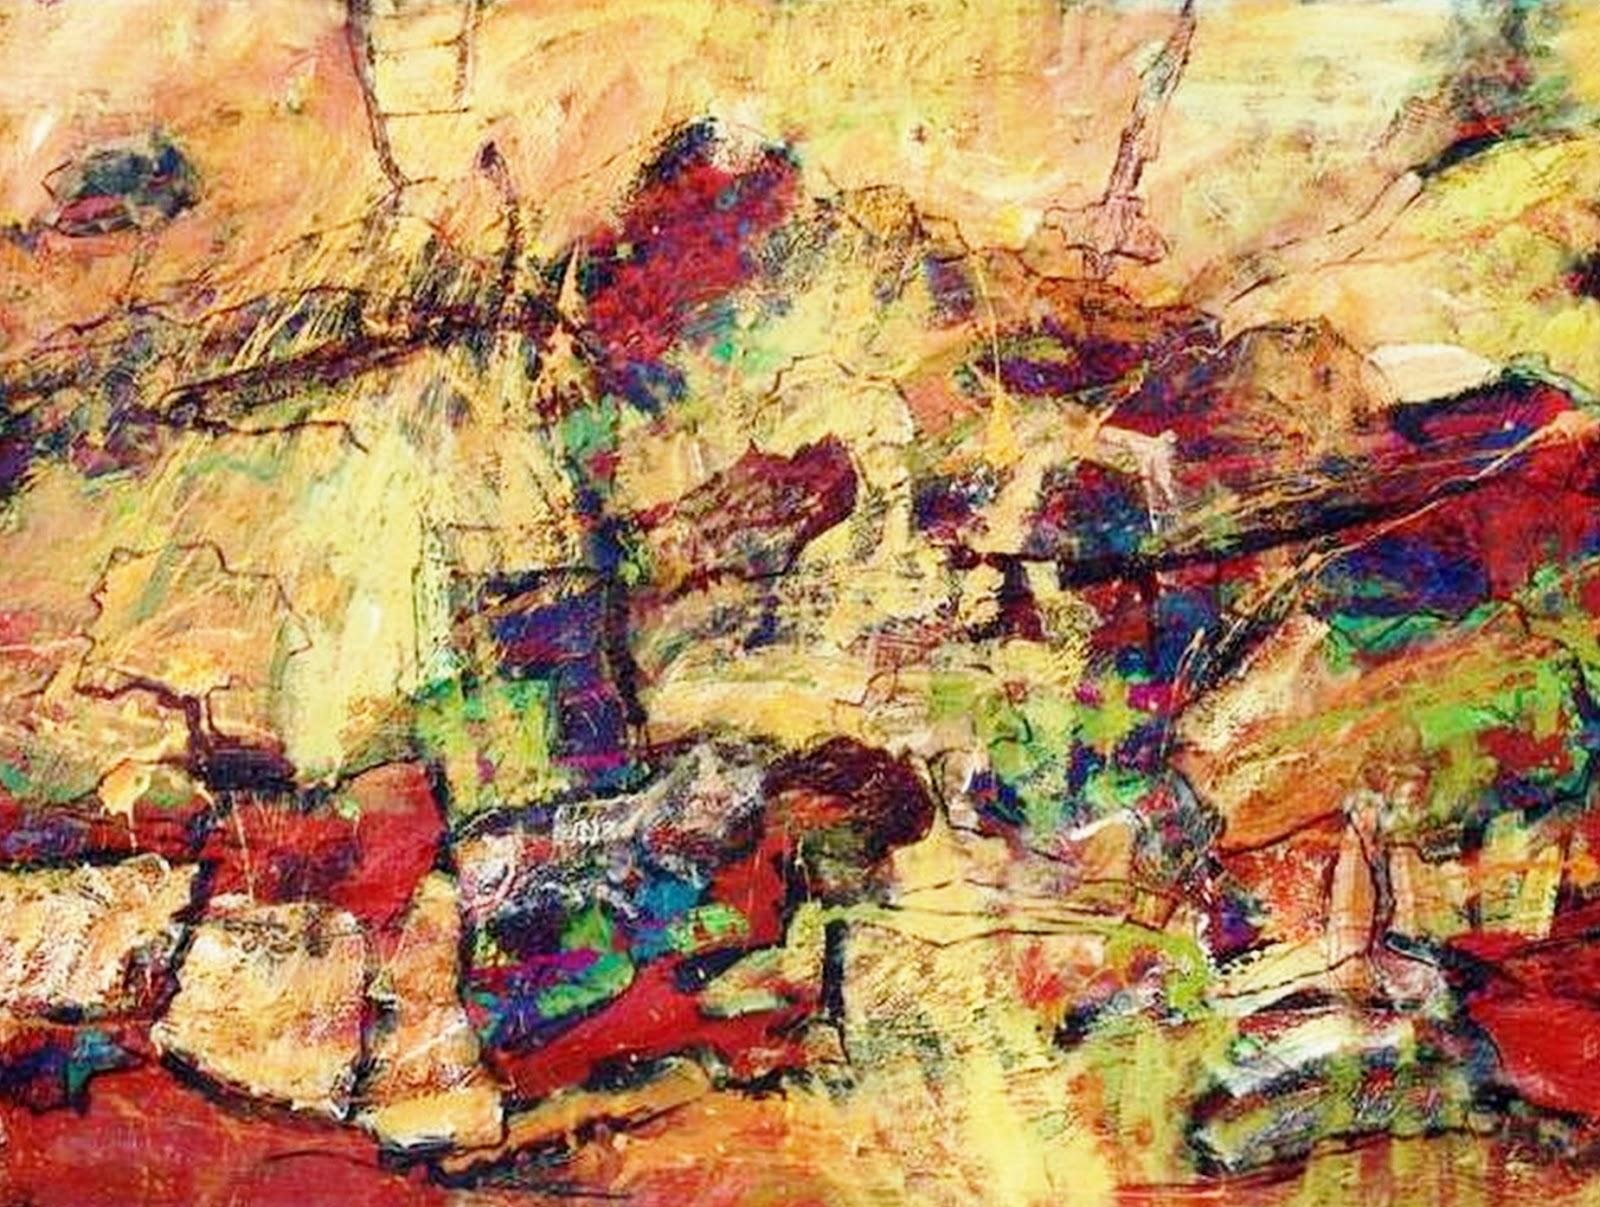 Cuadros modernos pinturas y dibujos 05 31 13 for Fotos cuadros abstractos modernos